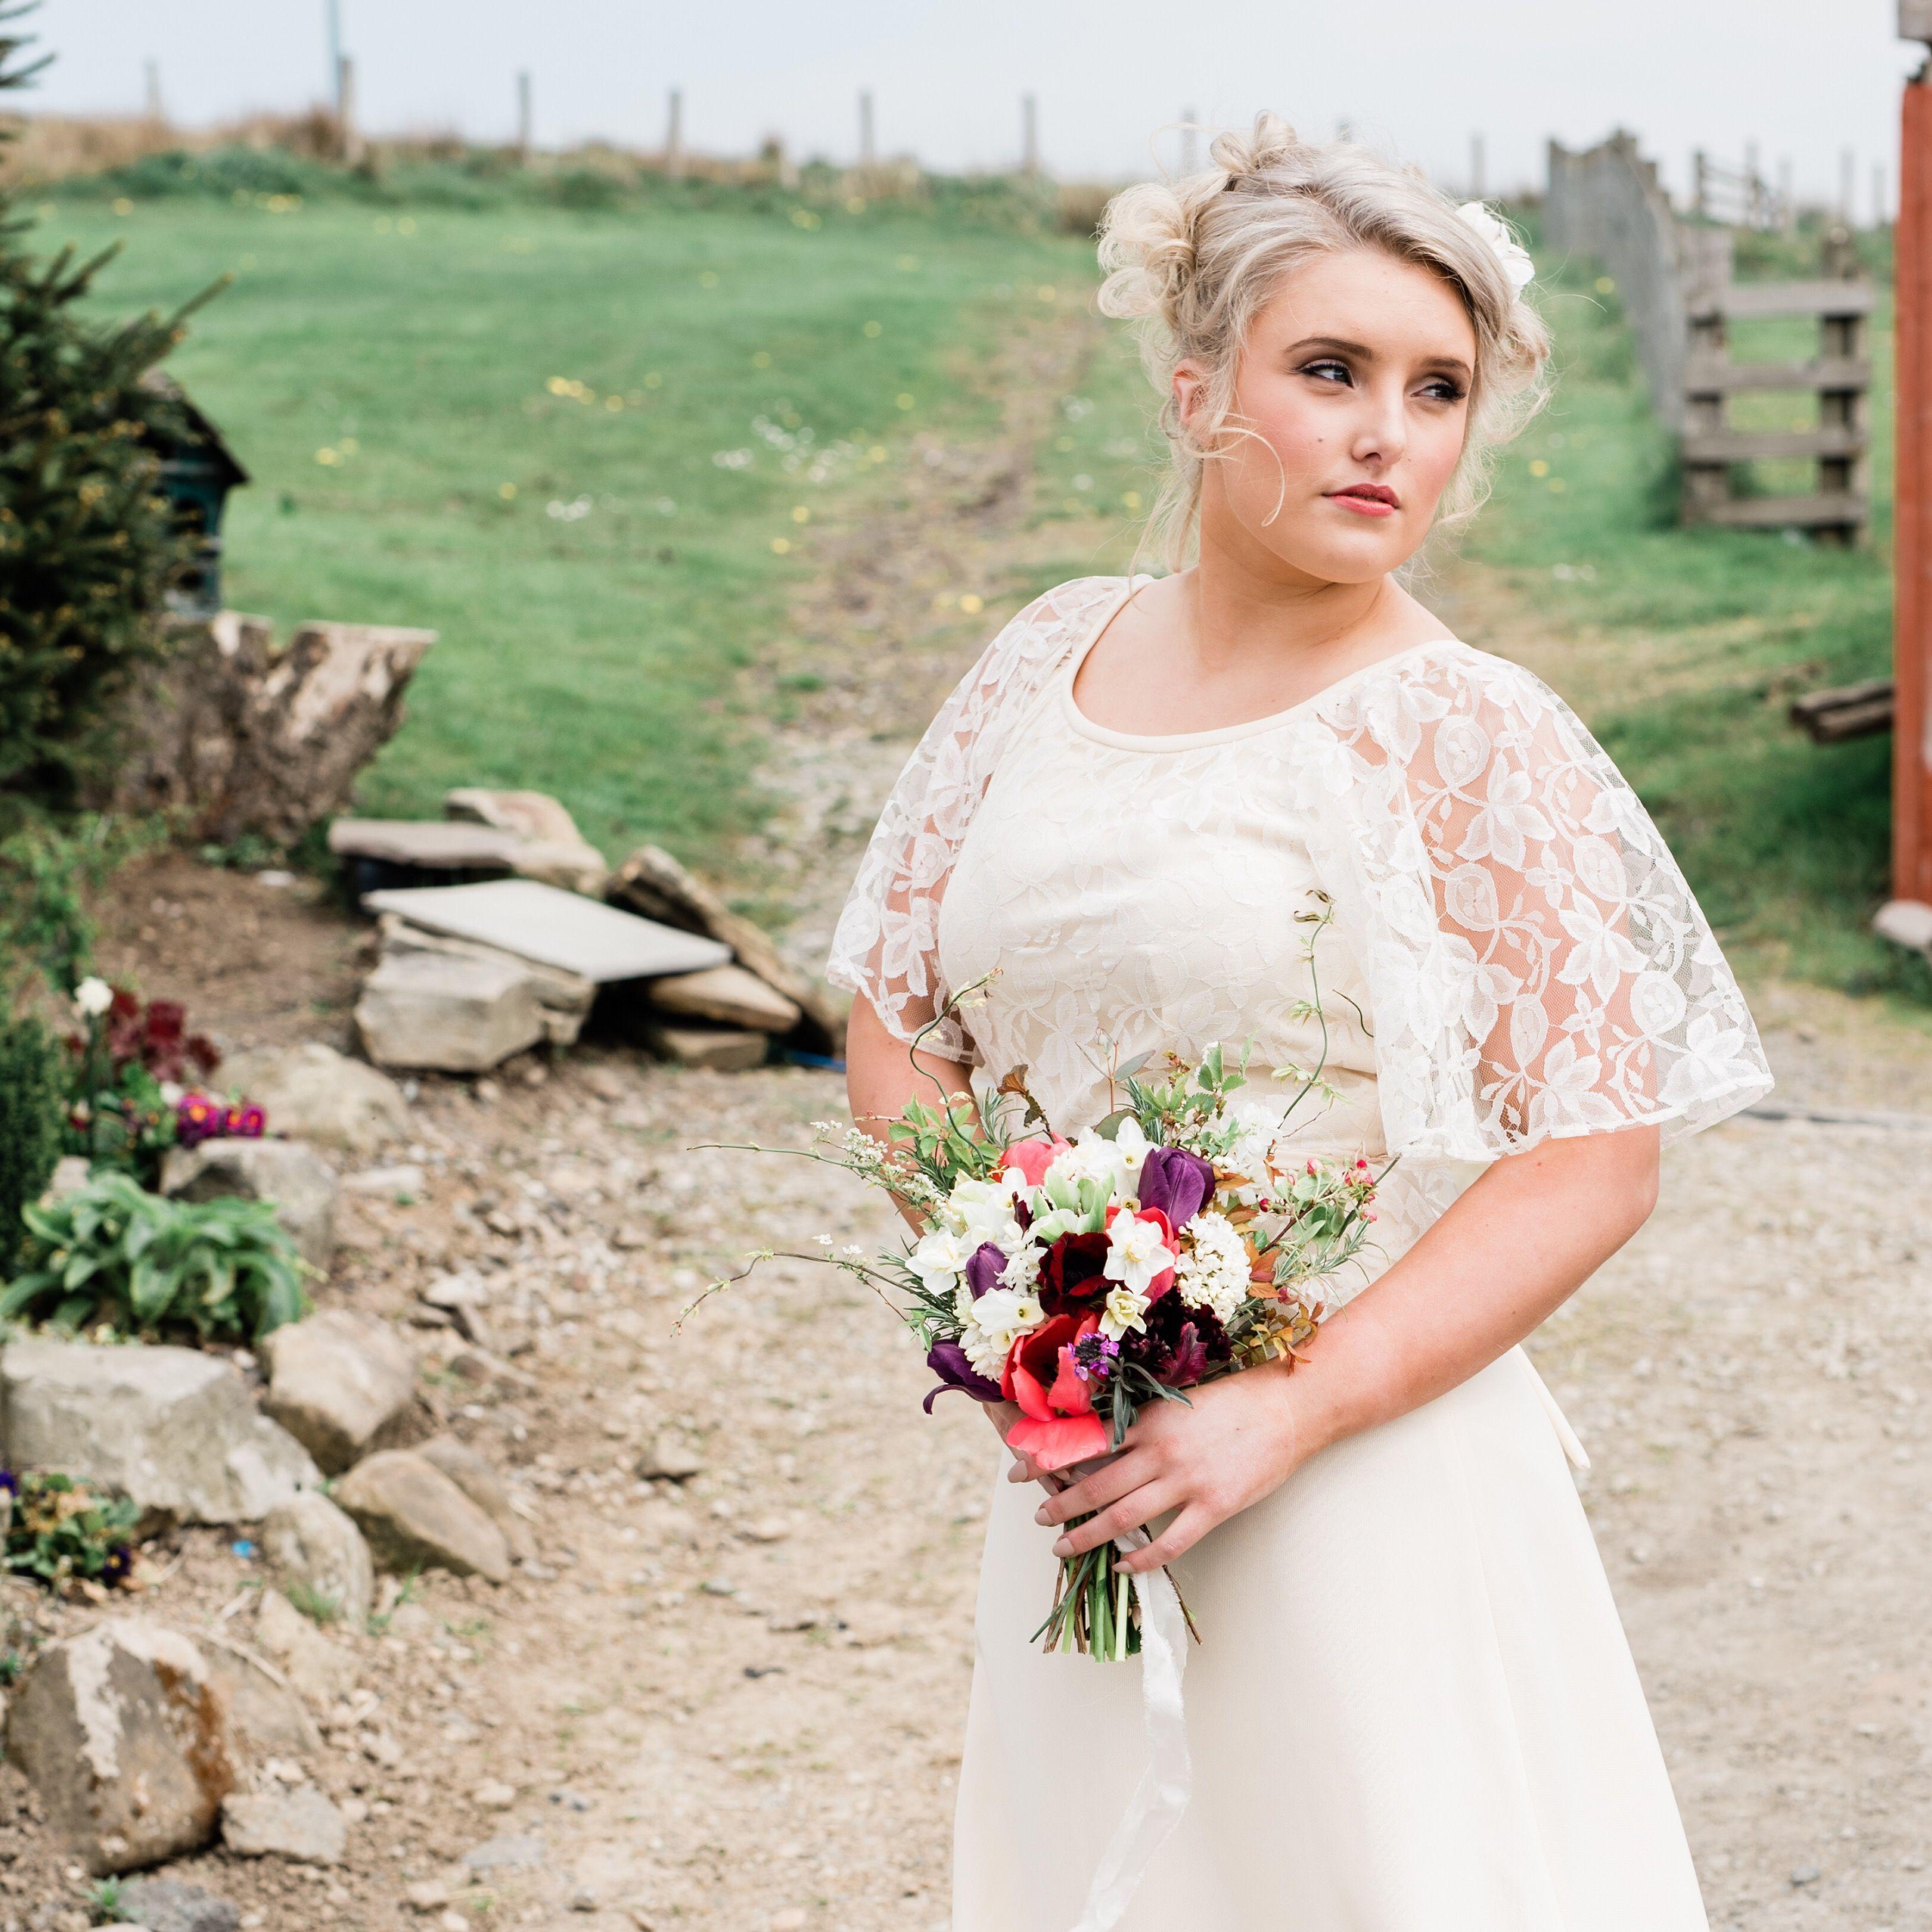 Available At Vintage Lane Bridal 💕